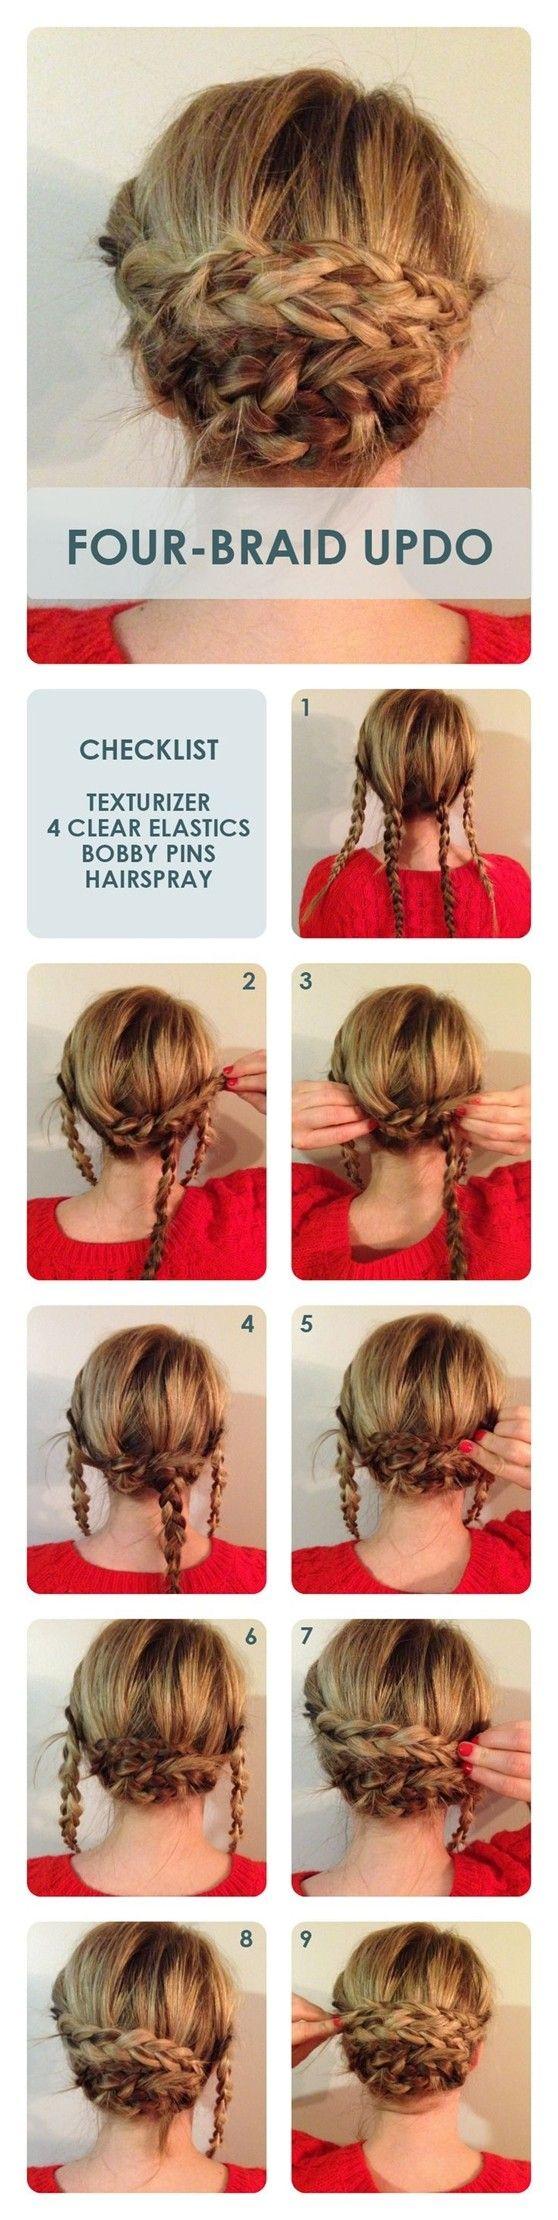 braided bun updos ideas updos updo and thin hair